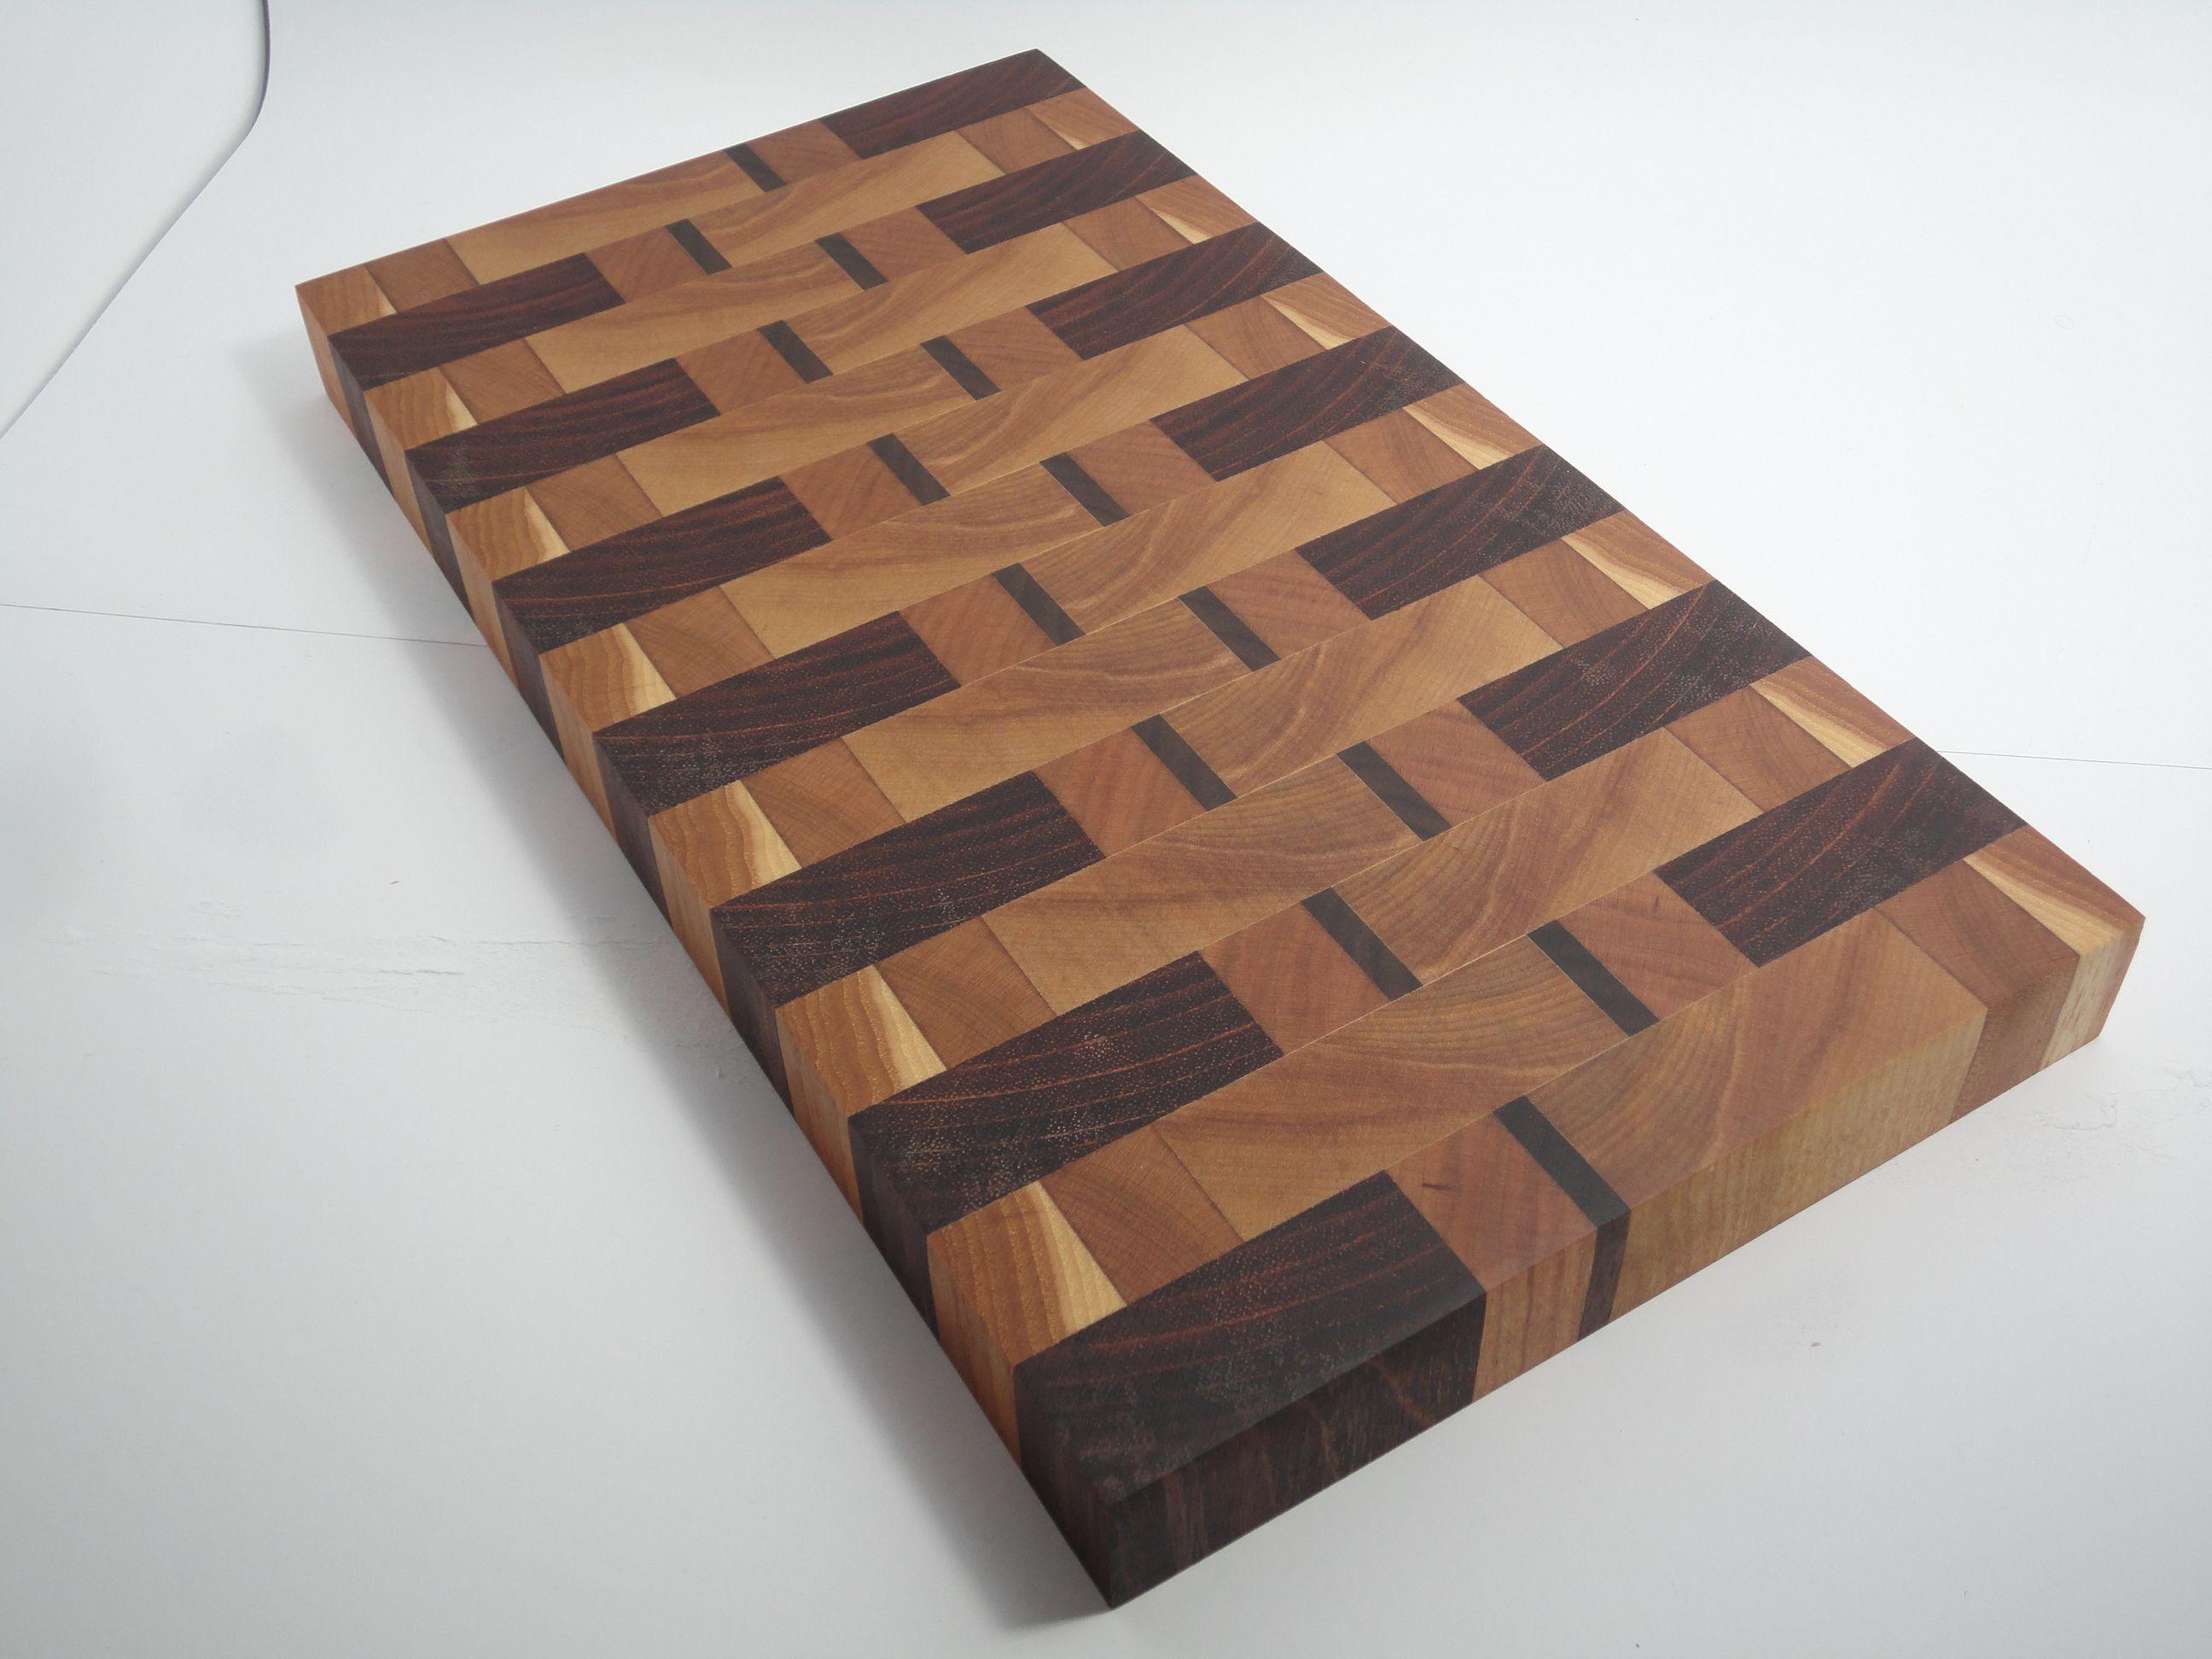 edge grain vs end grain cutting boards walnut purpleheart maple jatoba and cherry end grain. Black Bedroom Furniture Sets. Home Design Ideas